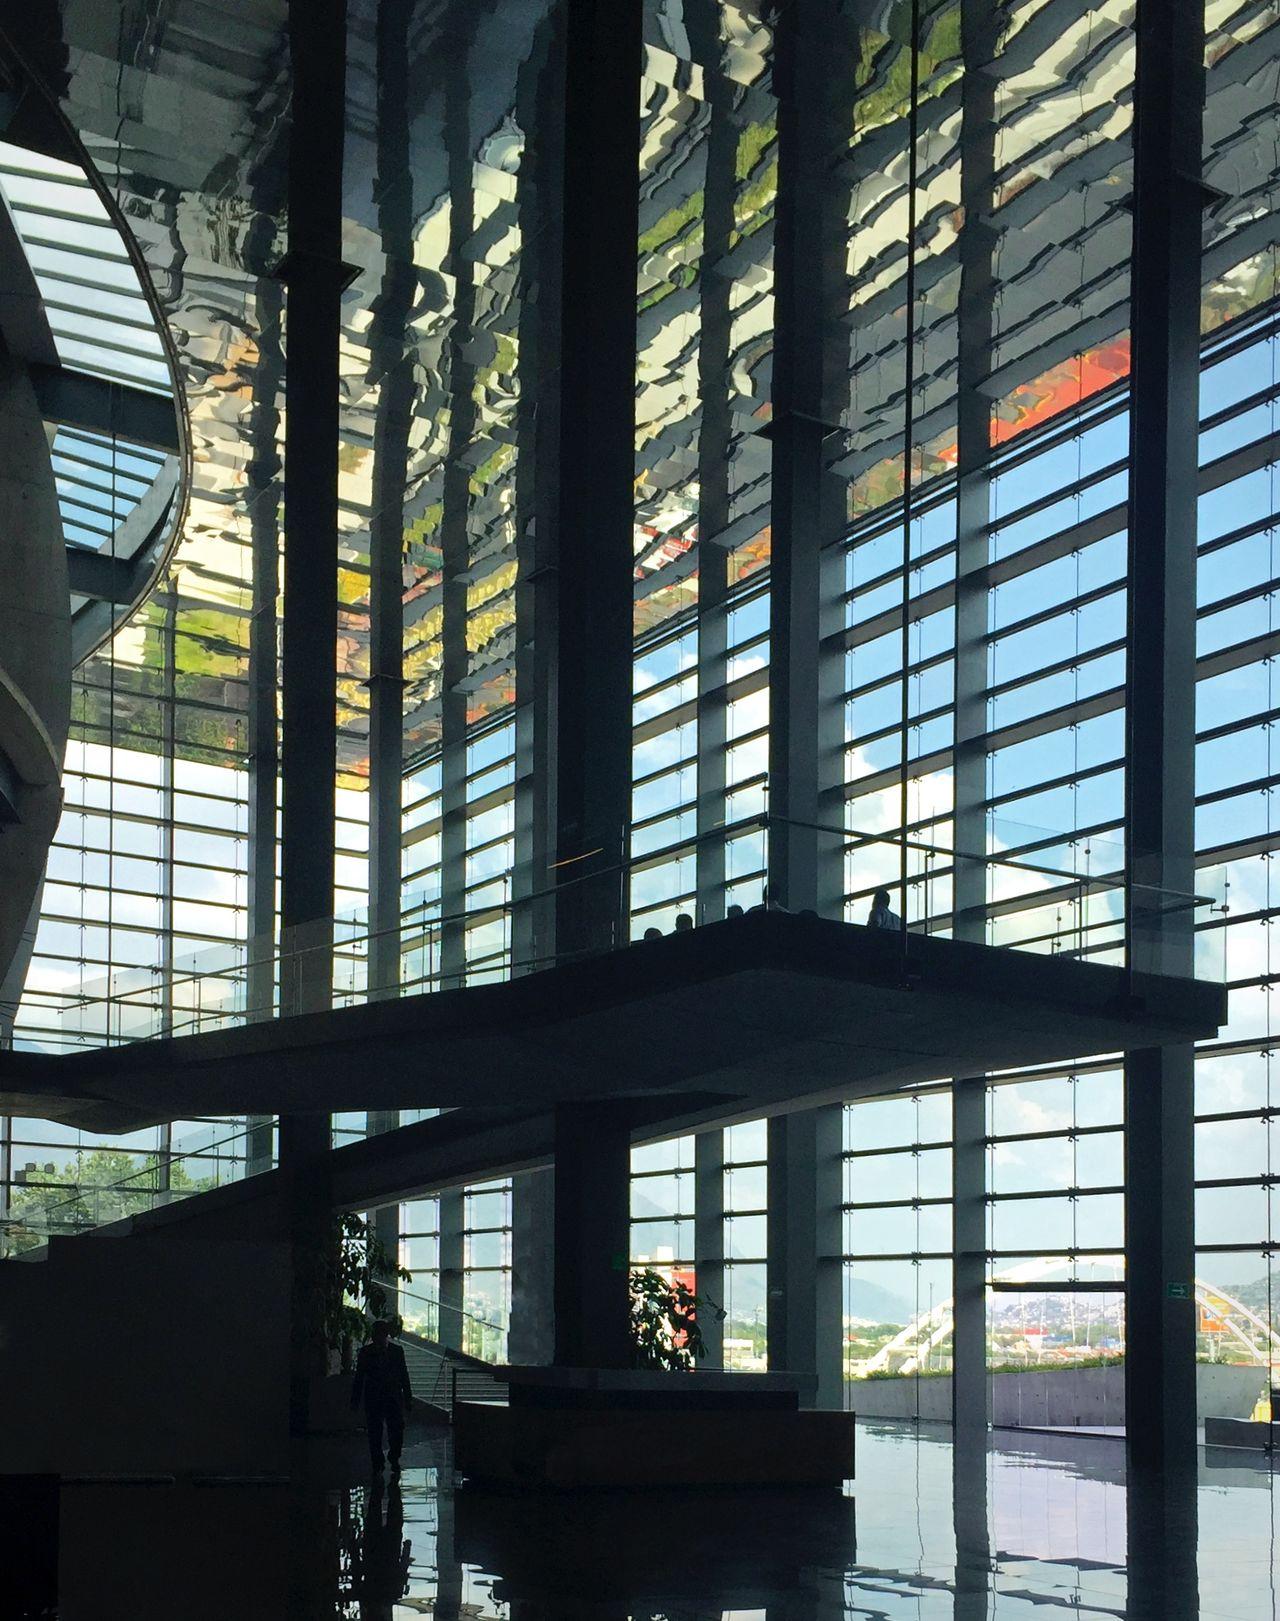 352 / 366 Agustin Landa Agustinlanda Architecture Building Built Structure Glass - Material Lines And Shapes Pabellon M PabellonM Silouette Silouette & Sky Window